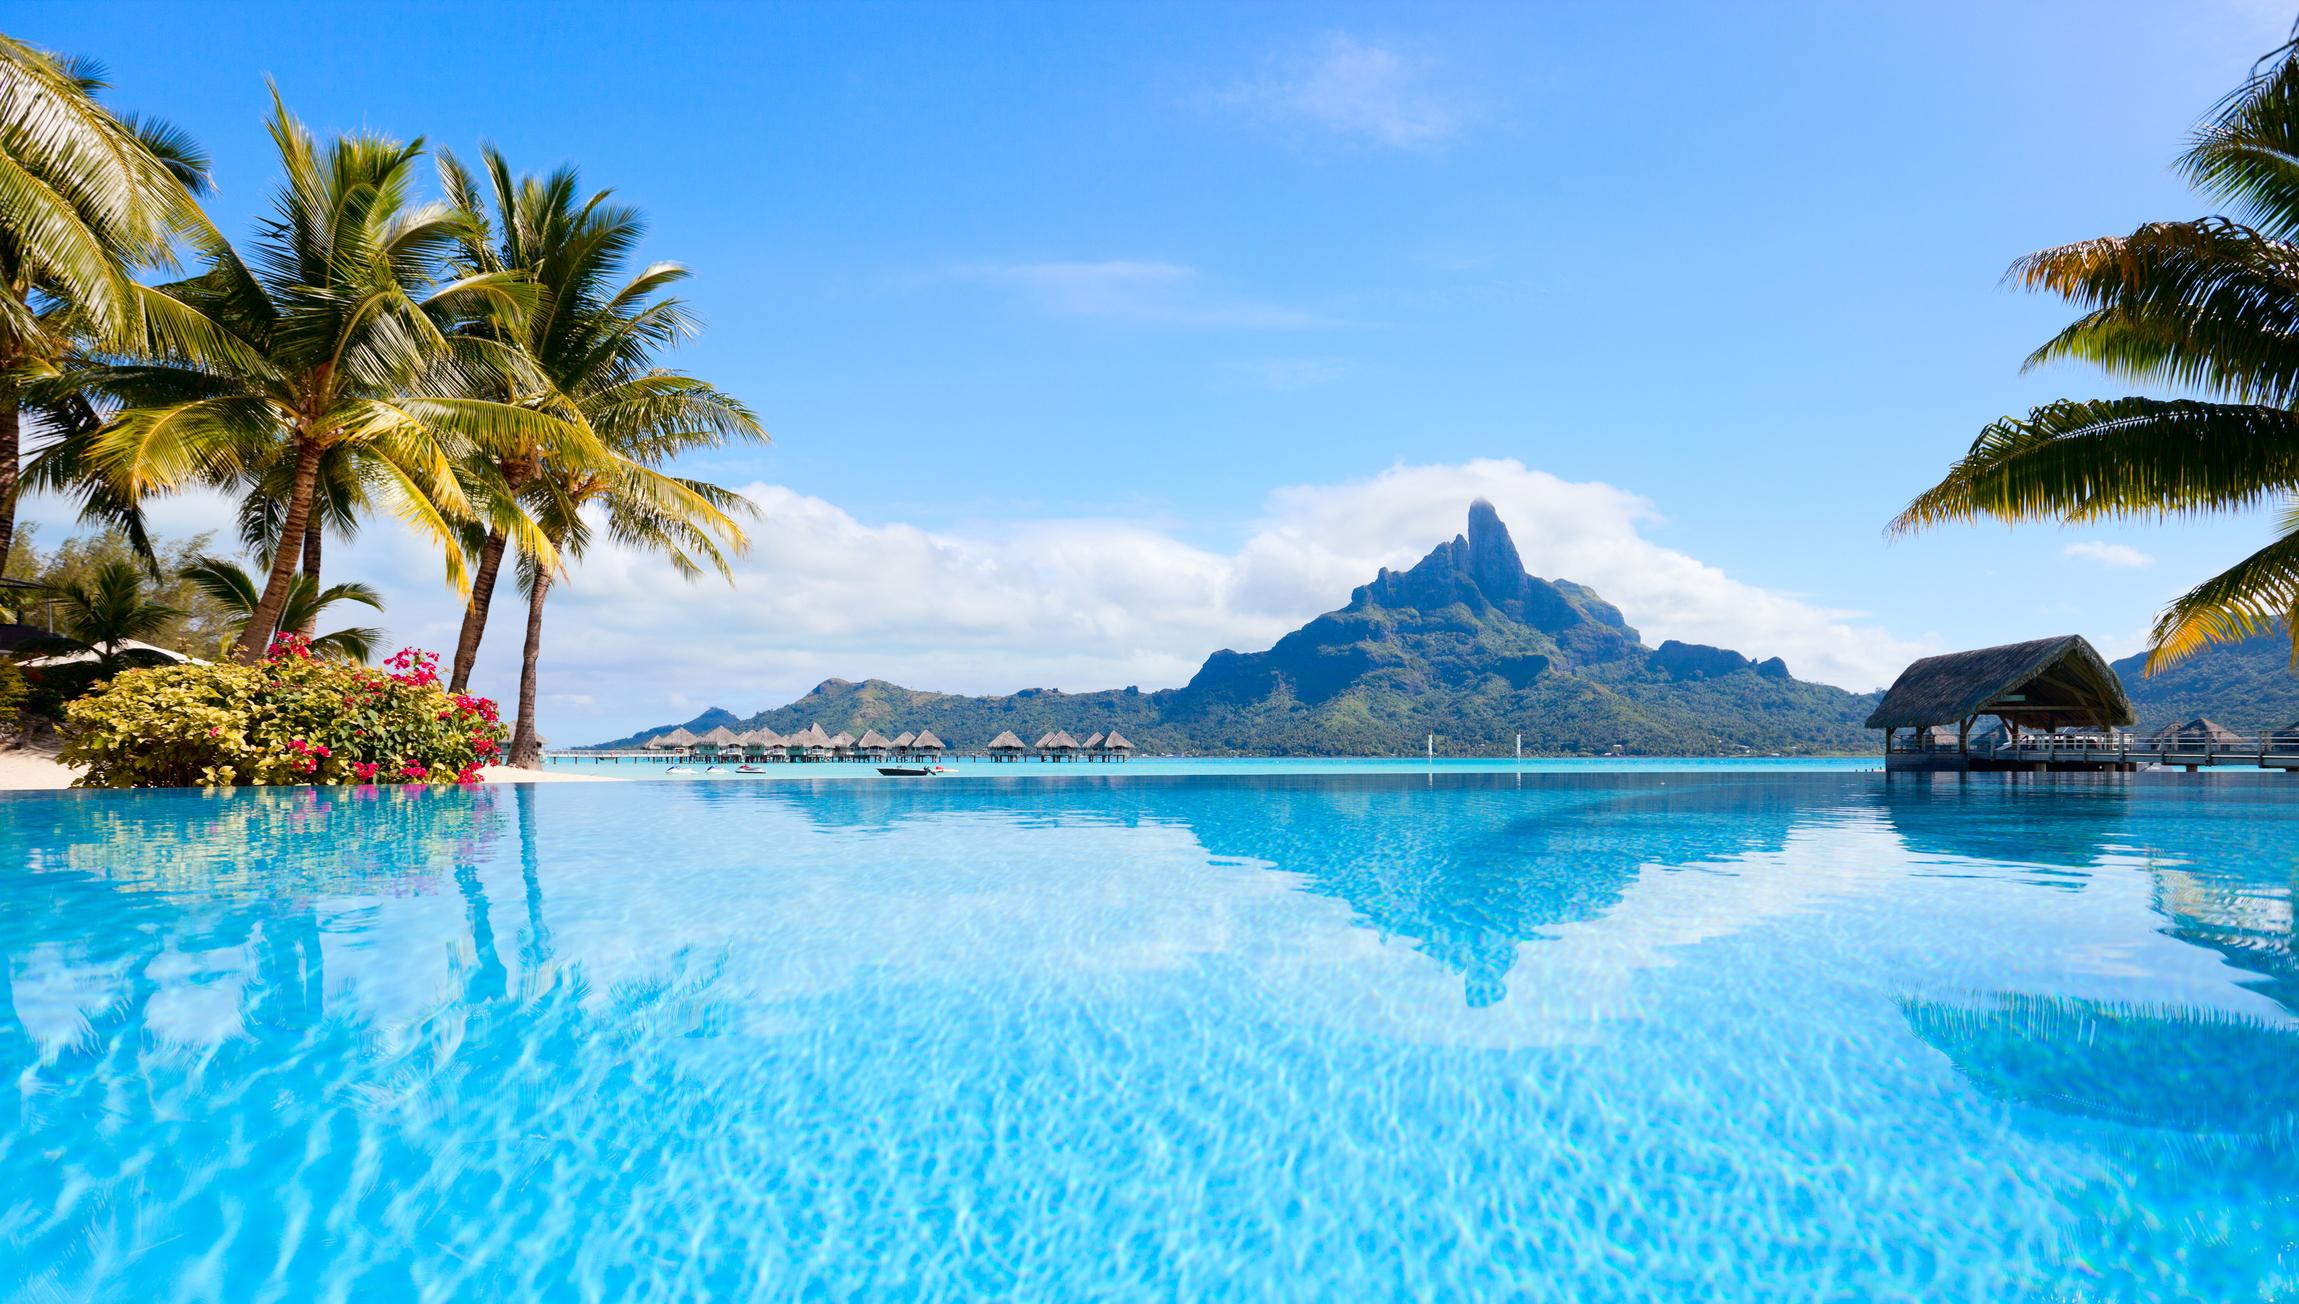 S Pac - Tahiti, Bora Bora.jpg